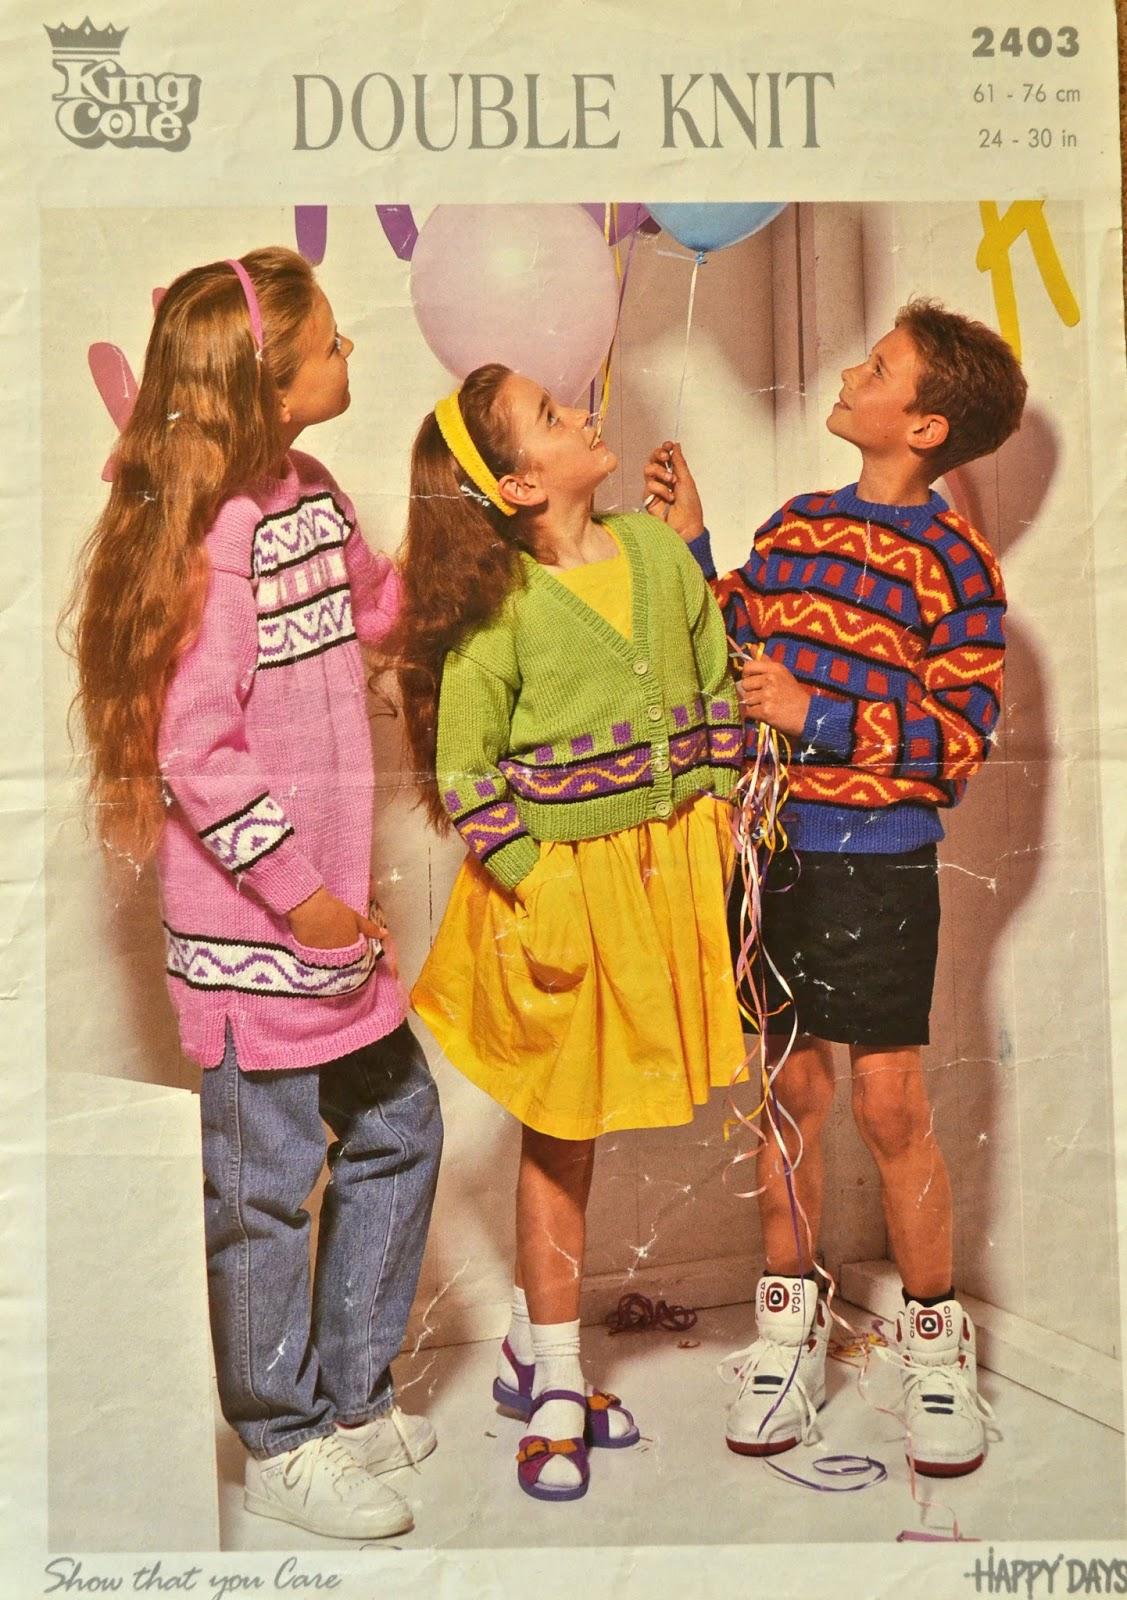 Knitting Novice: Vintage 80s Knitting Patterns - Part 2